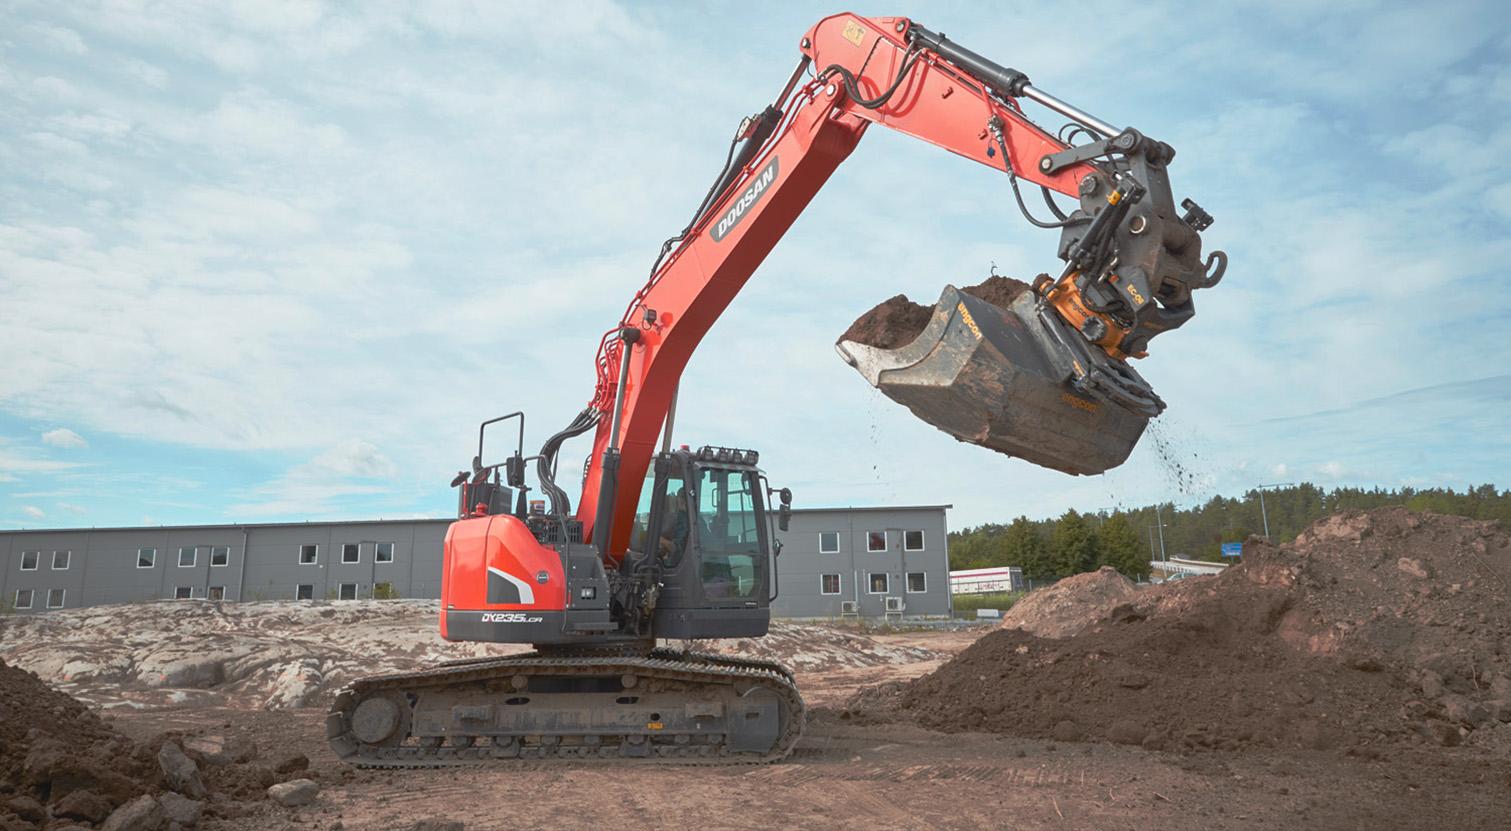 En sådan grävmaskin i Stockholm hyr vi ut